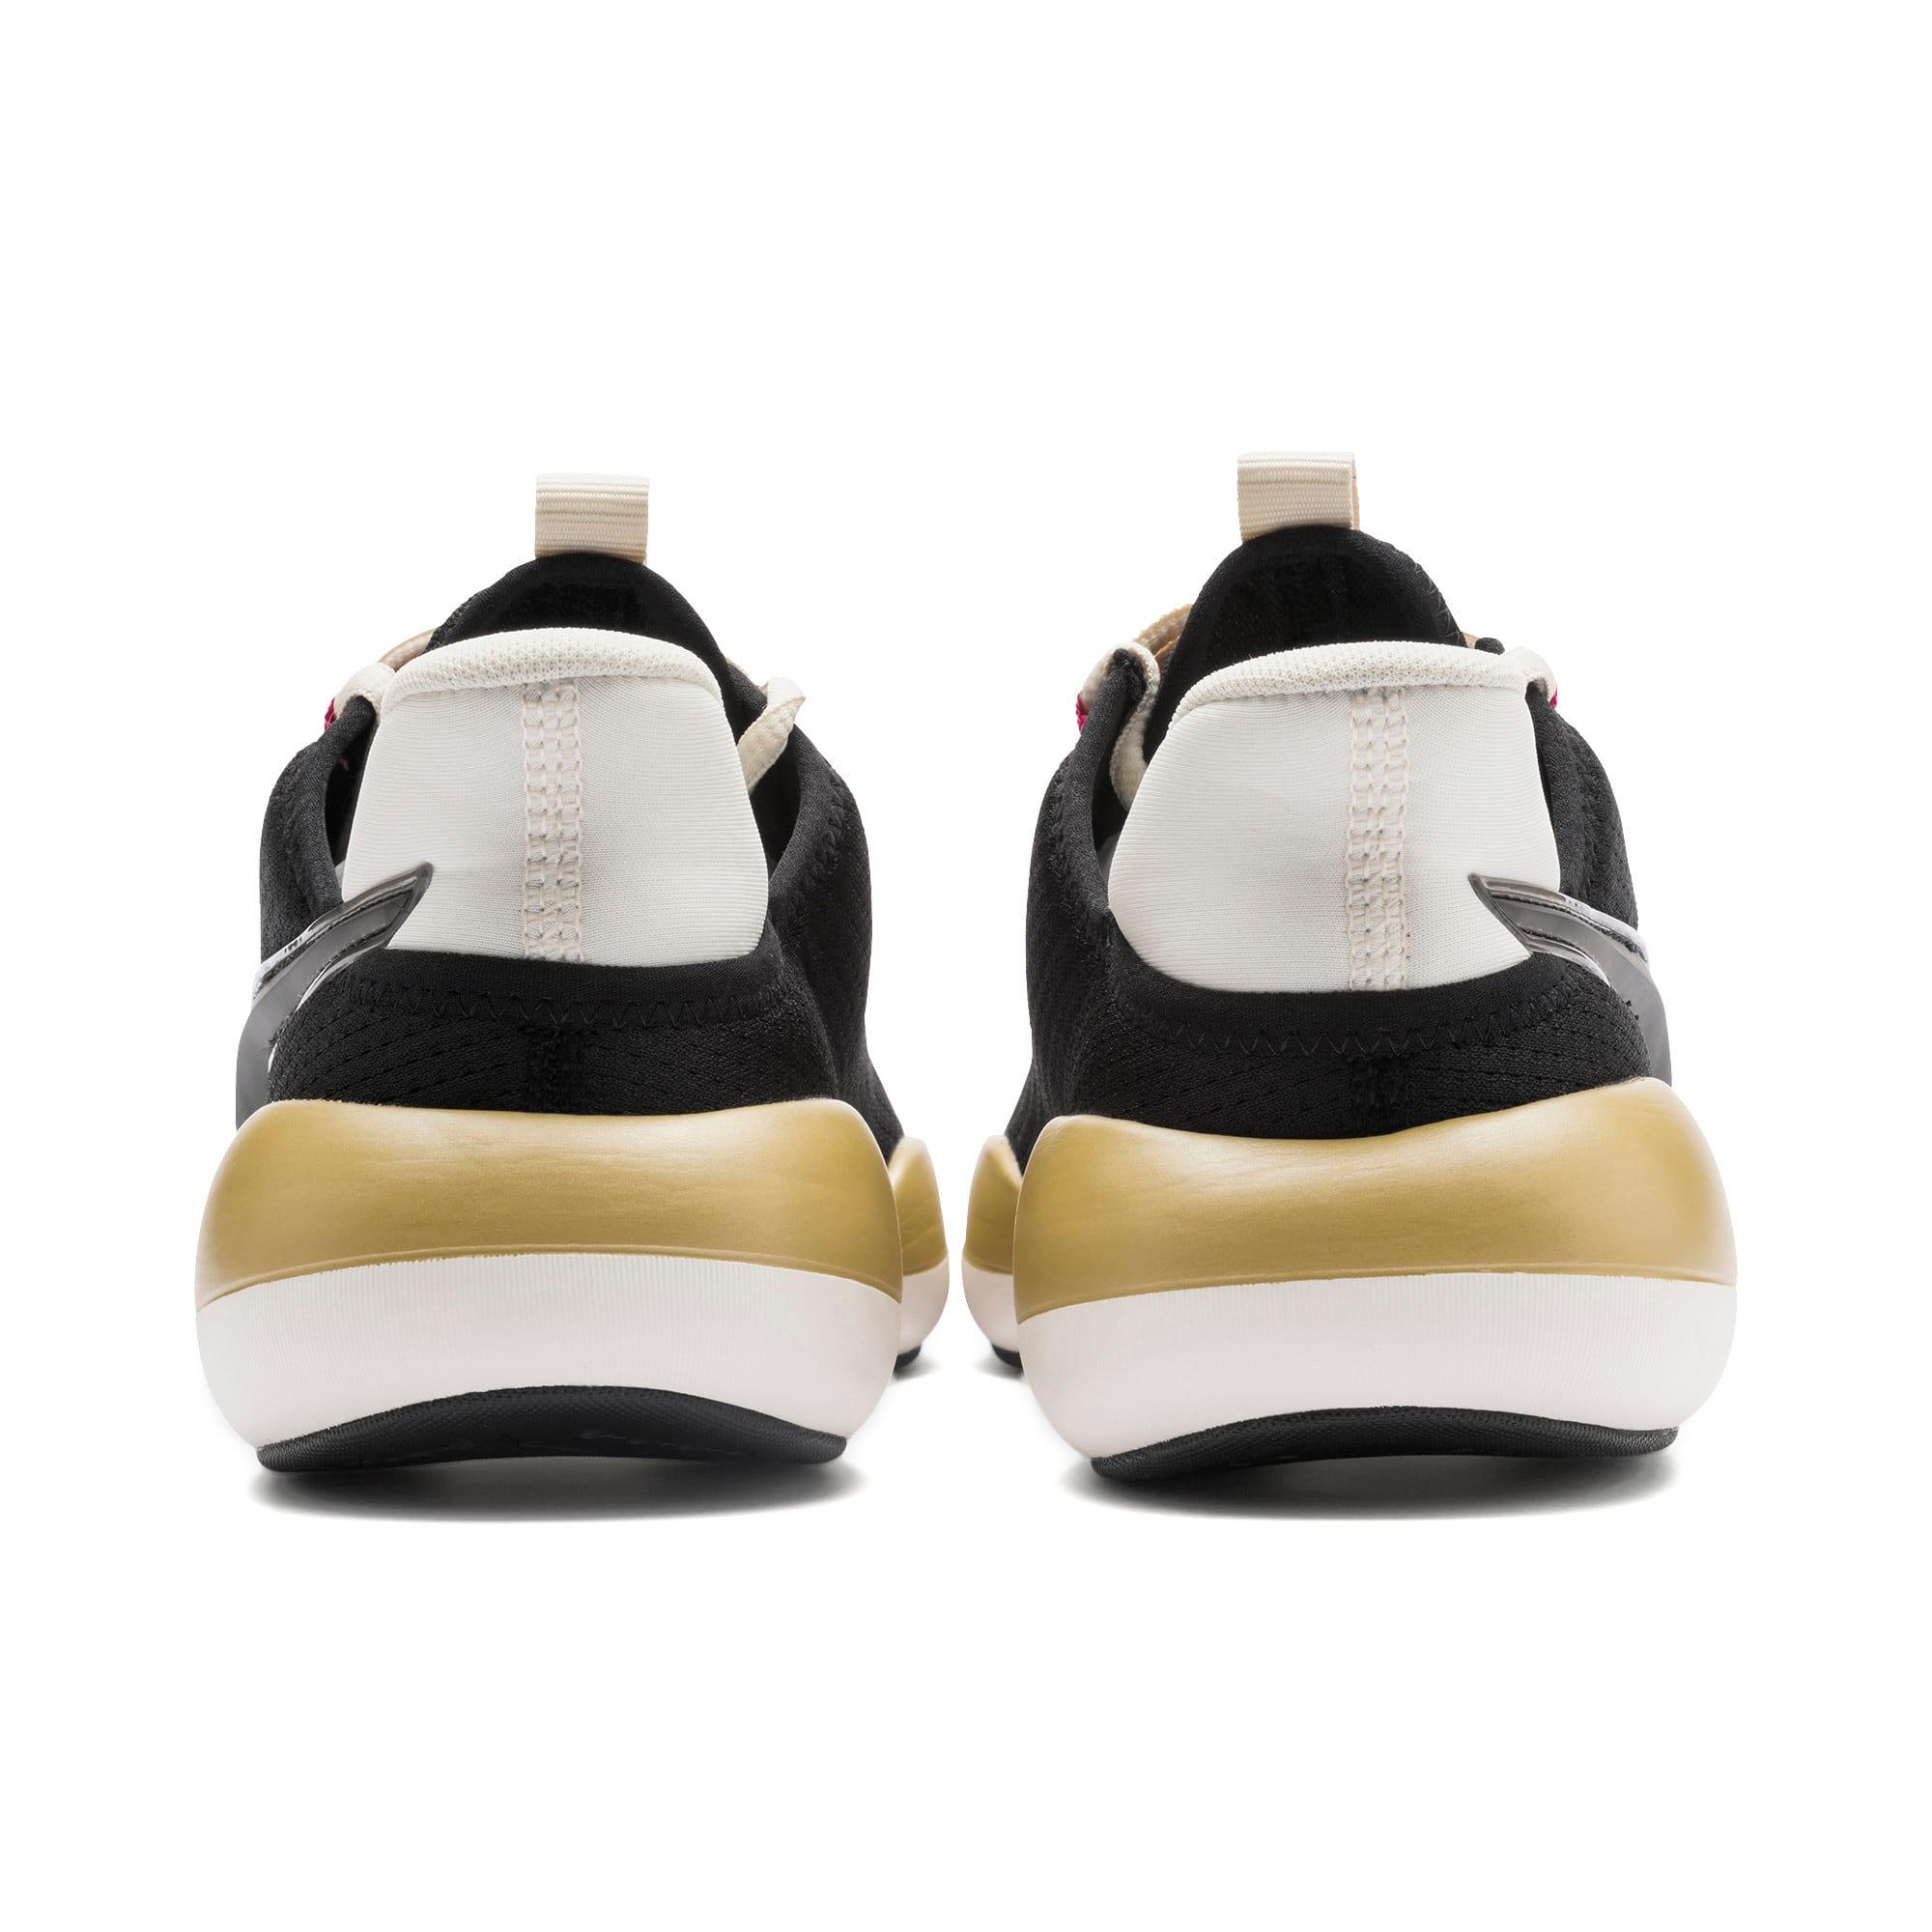 Thumbnail 3 of Mode XT Sweet Women's Training Shoes, Black- White-Purple, medium